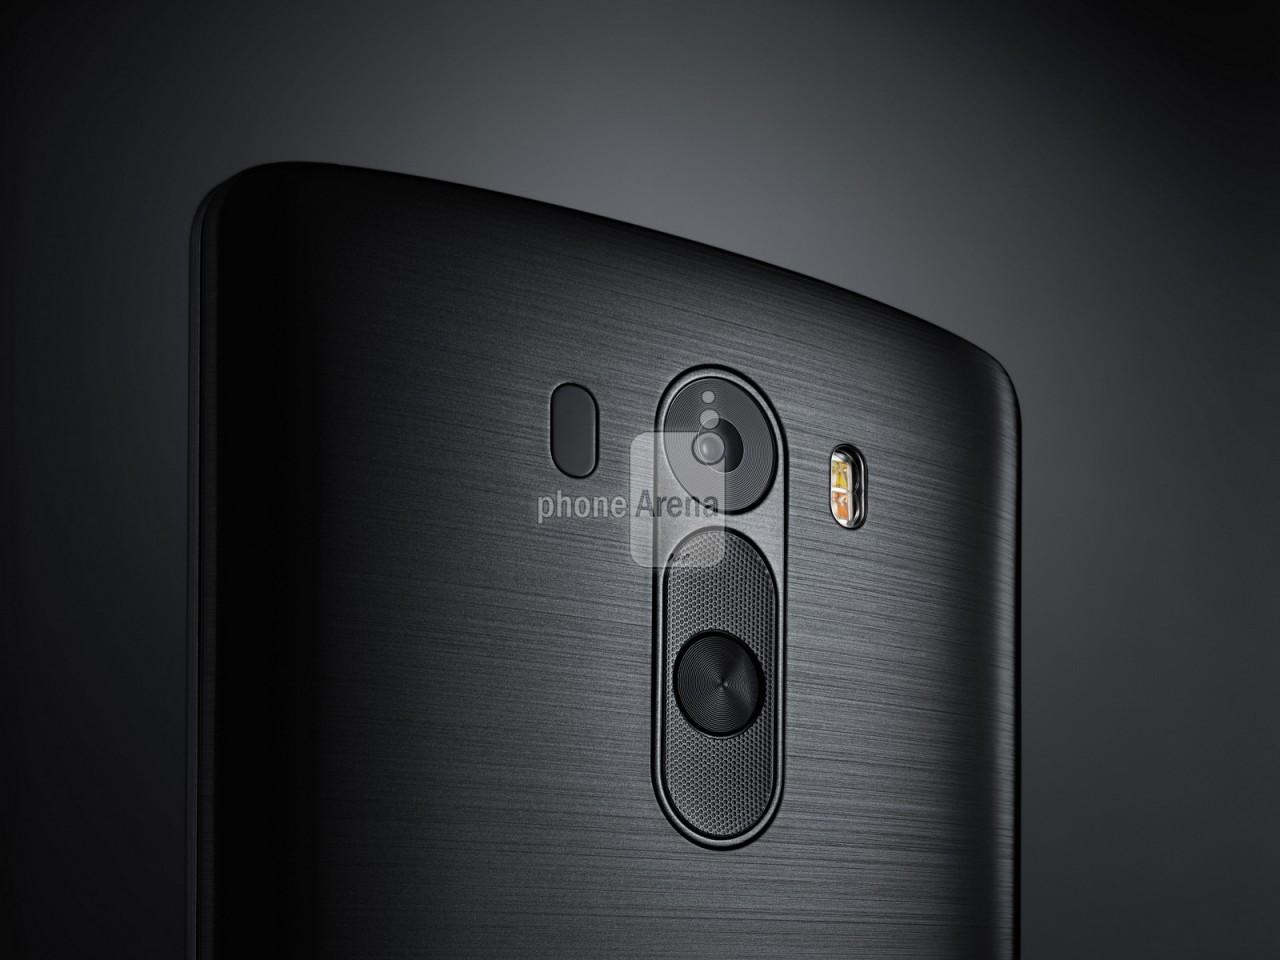 LG-G3-press-renders-appear-3